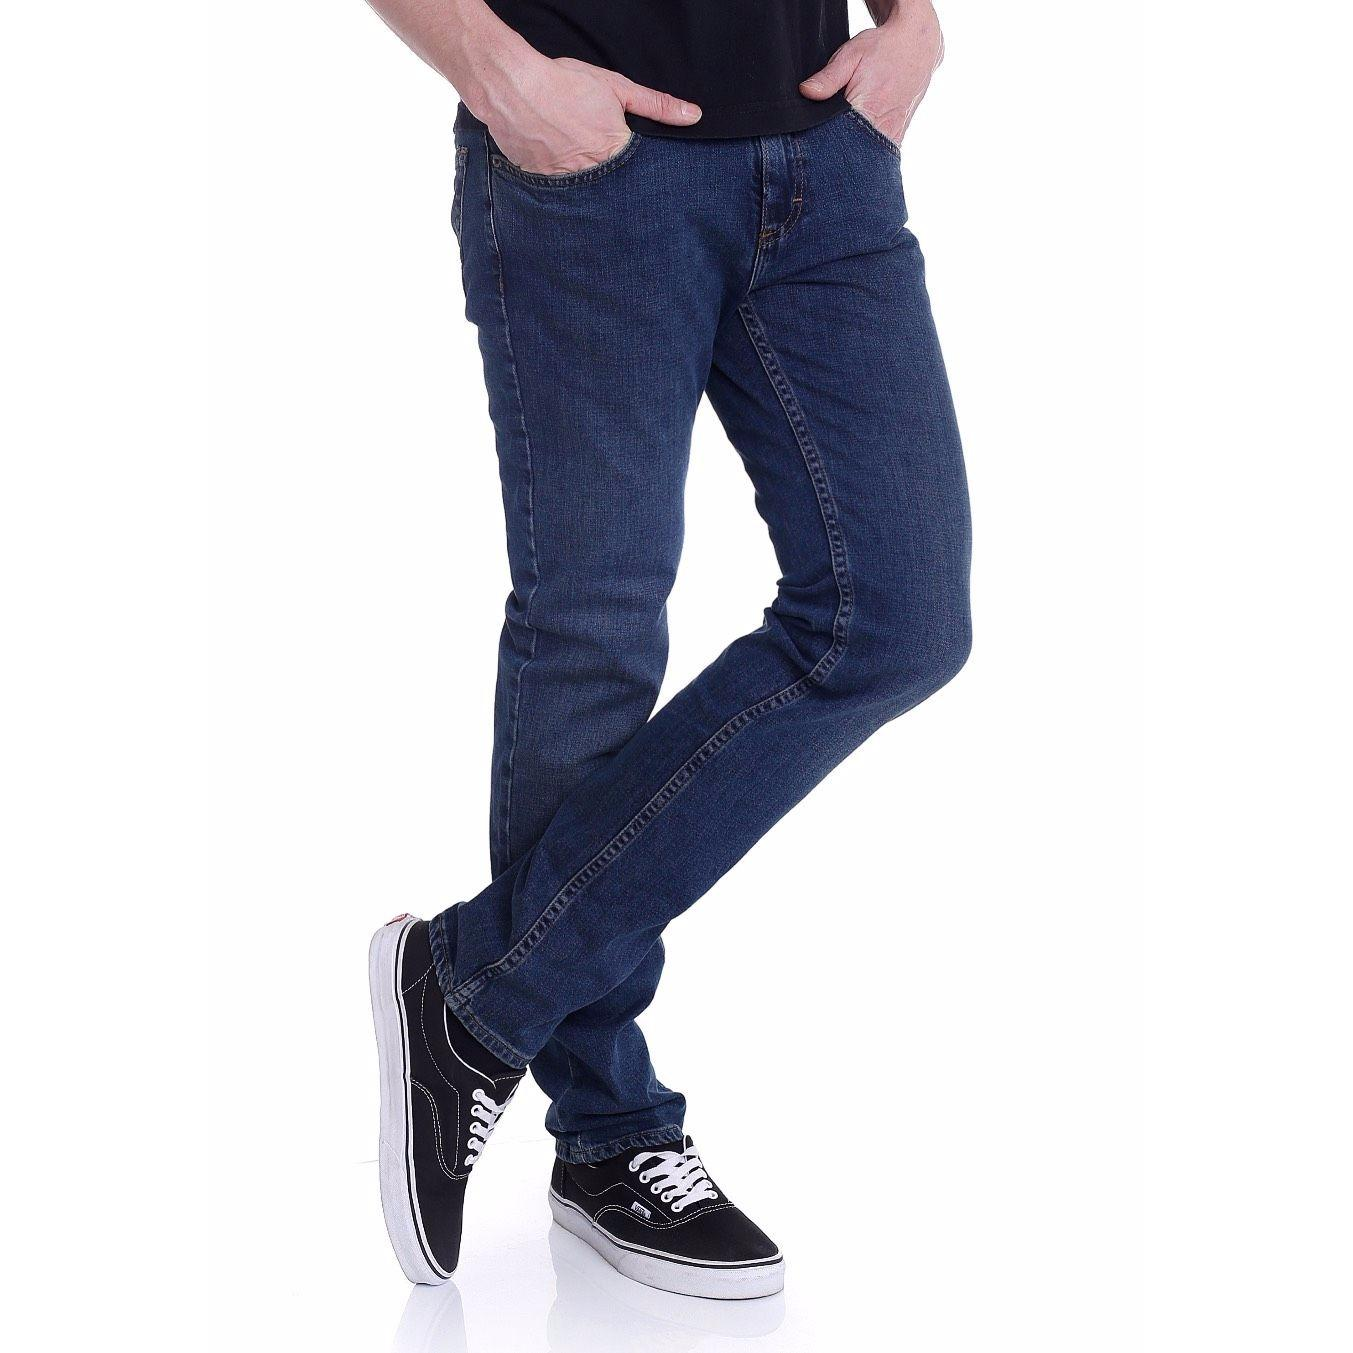 Harga Kerak Store Celana Jeans Pria Premium Skiny Jeans Pria Strreat Jawa Barat